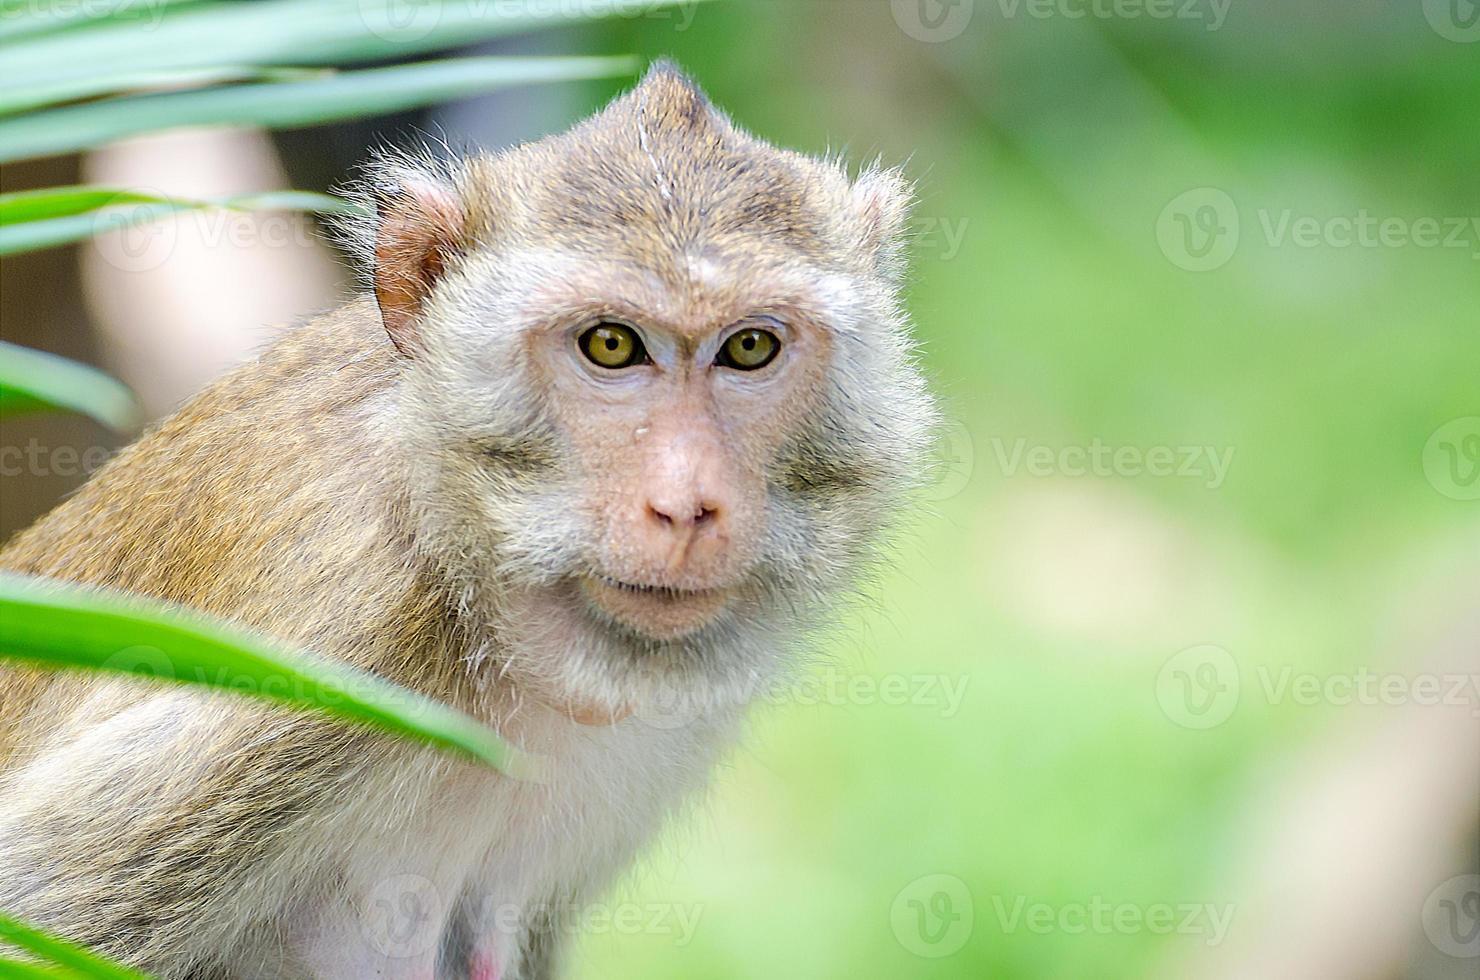 macaco de cola de cerdo (macaca nemestring) foto